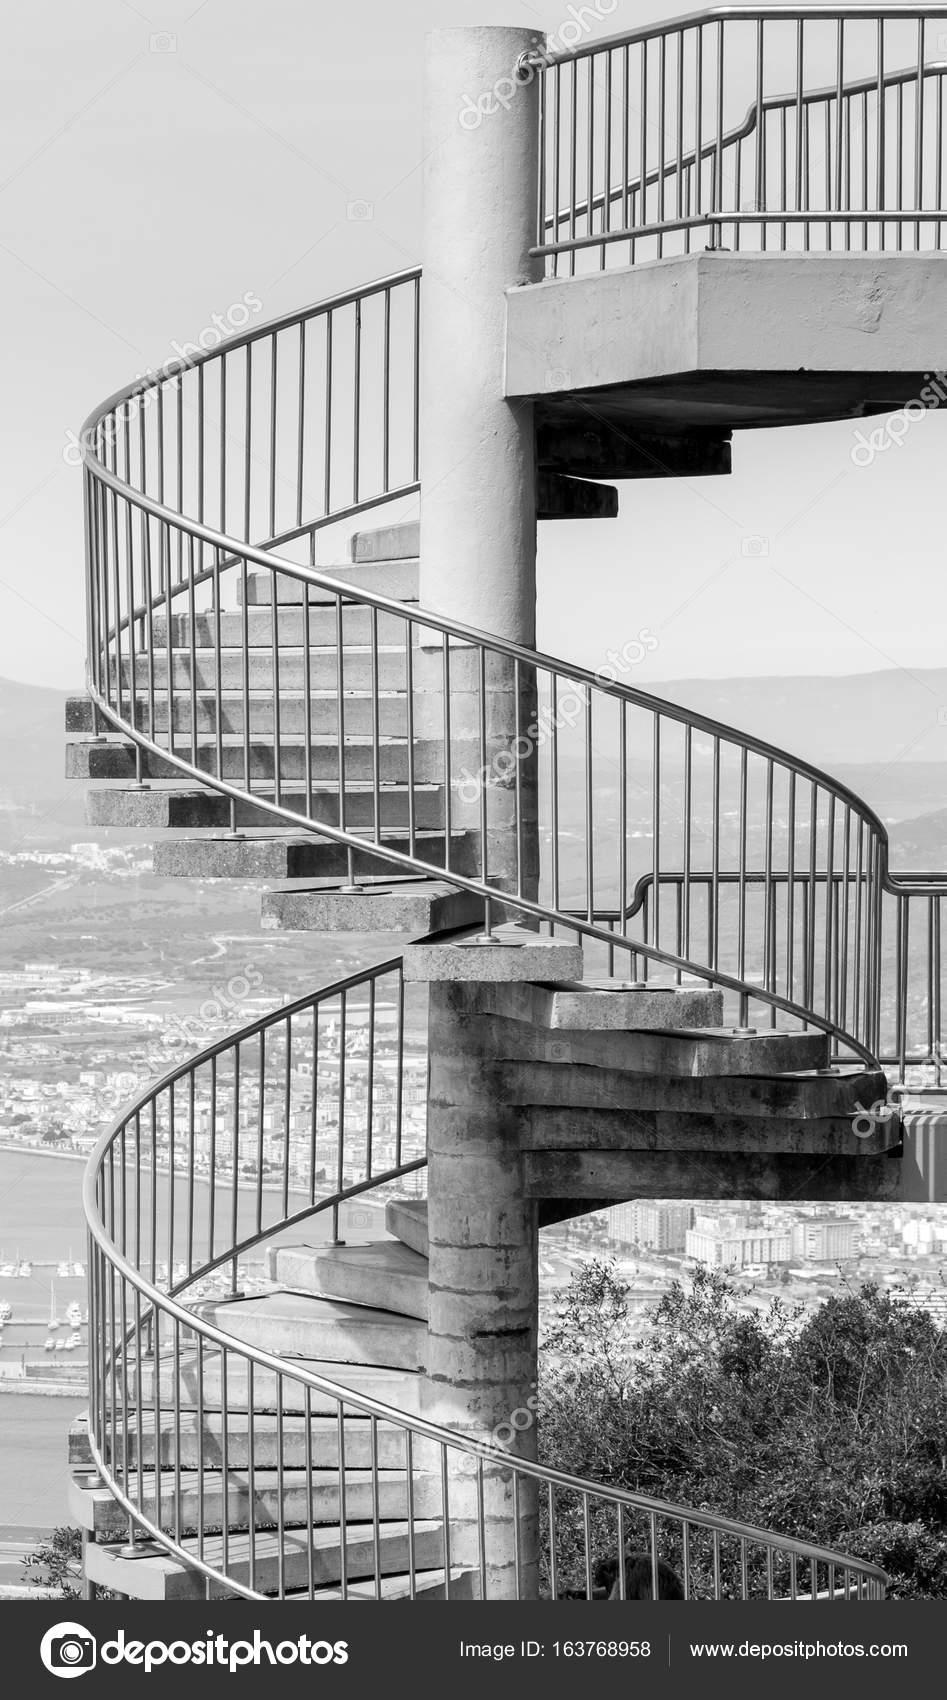 Escalera de caracol concreto — Foto de stock © johnbraid #163768958